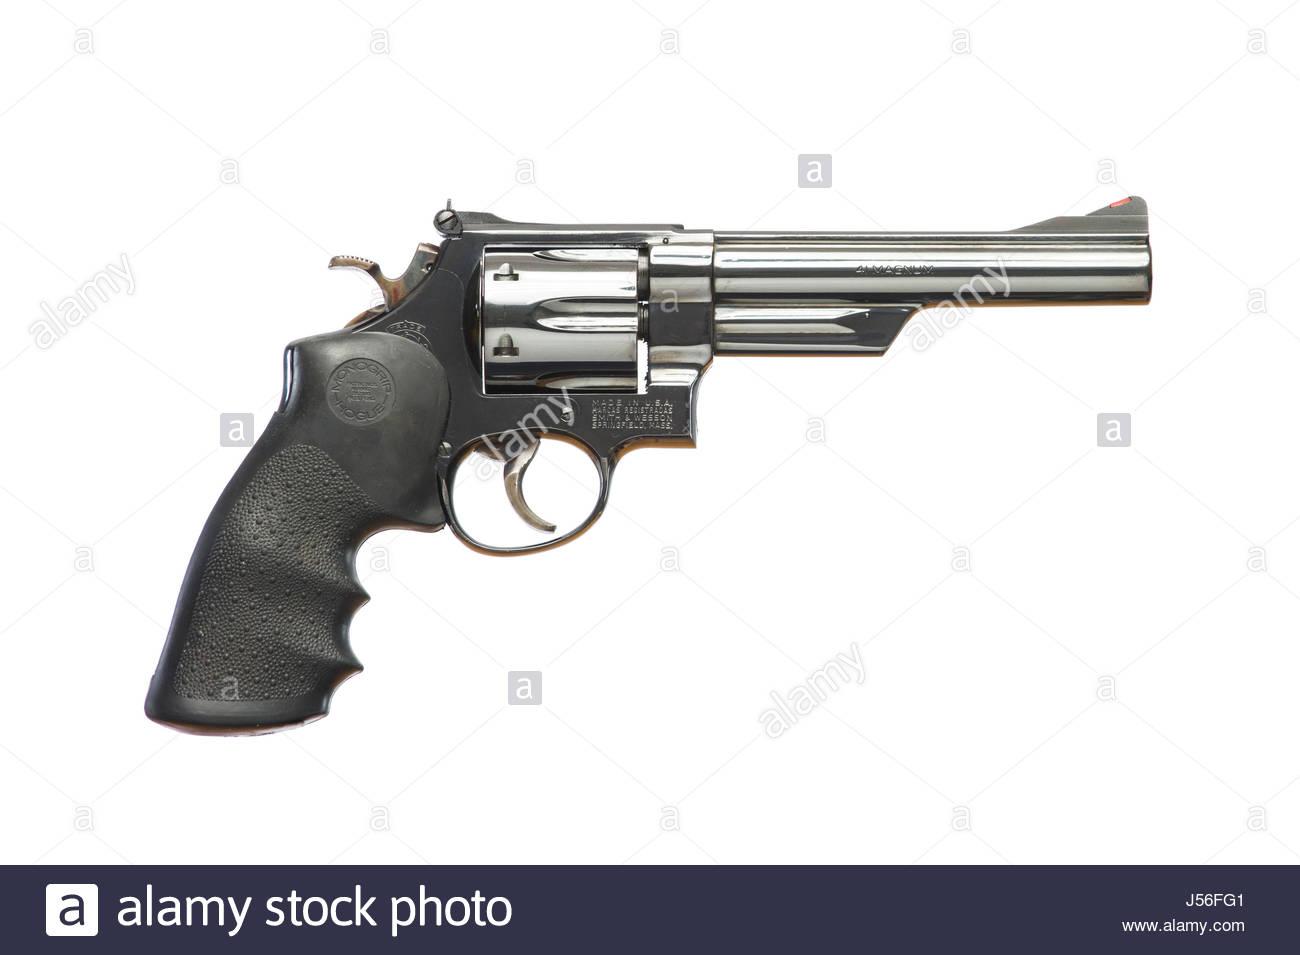 Smith & Wesson Model 57, N Frame, 6 inch barrel revolver pistol ...